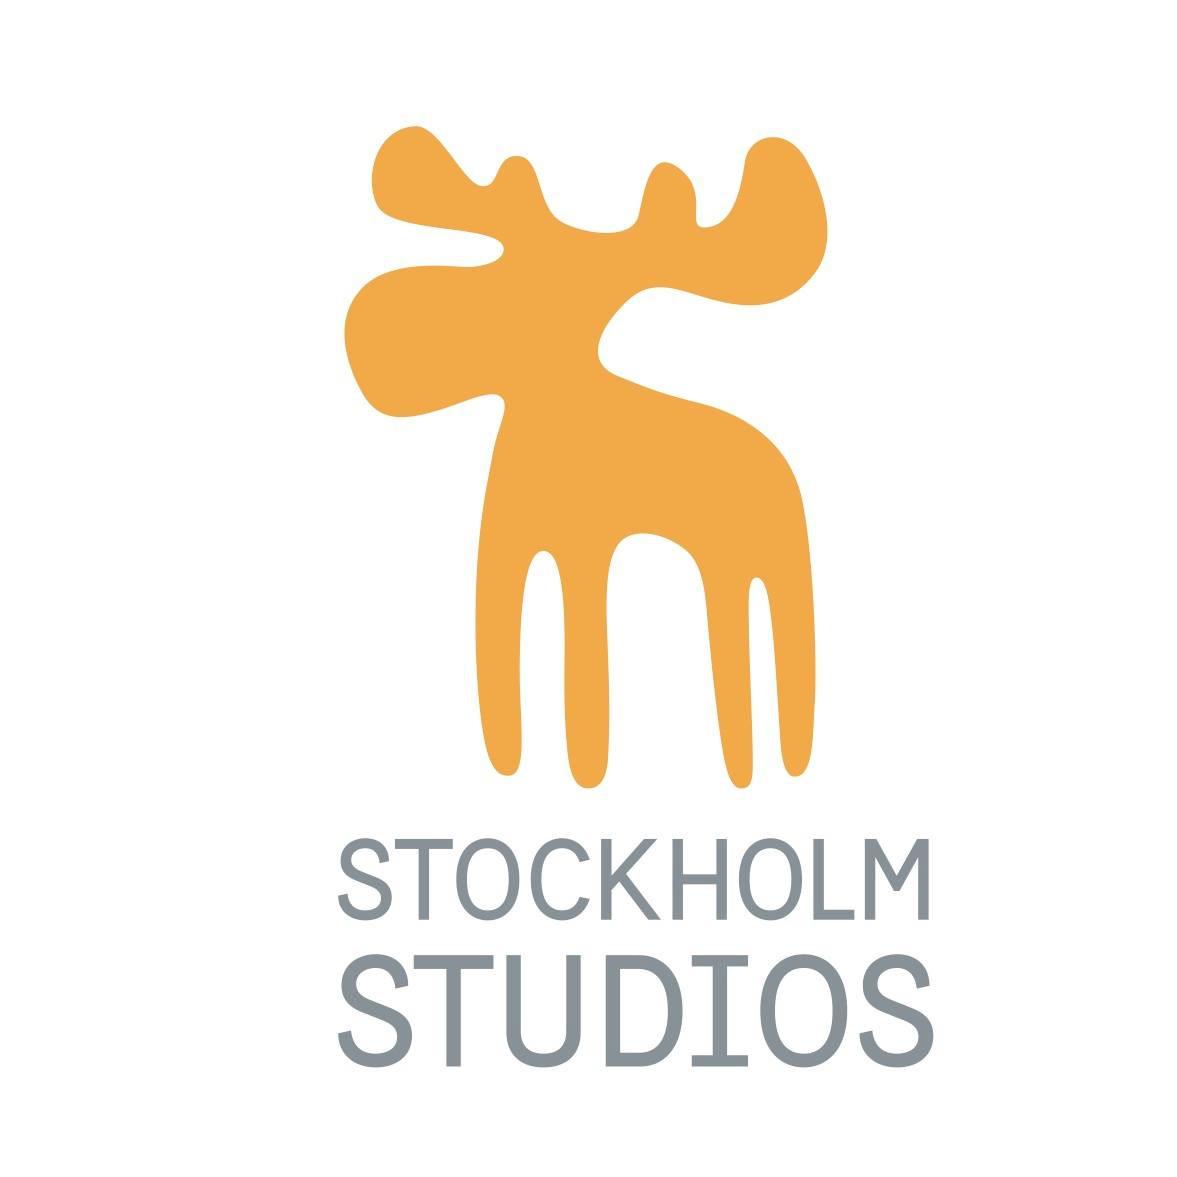 Stockholm Studios - Coliving Company